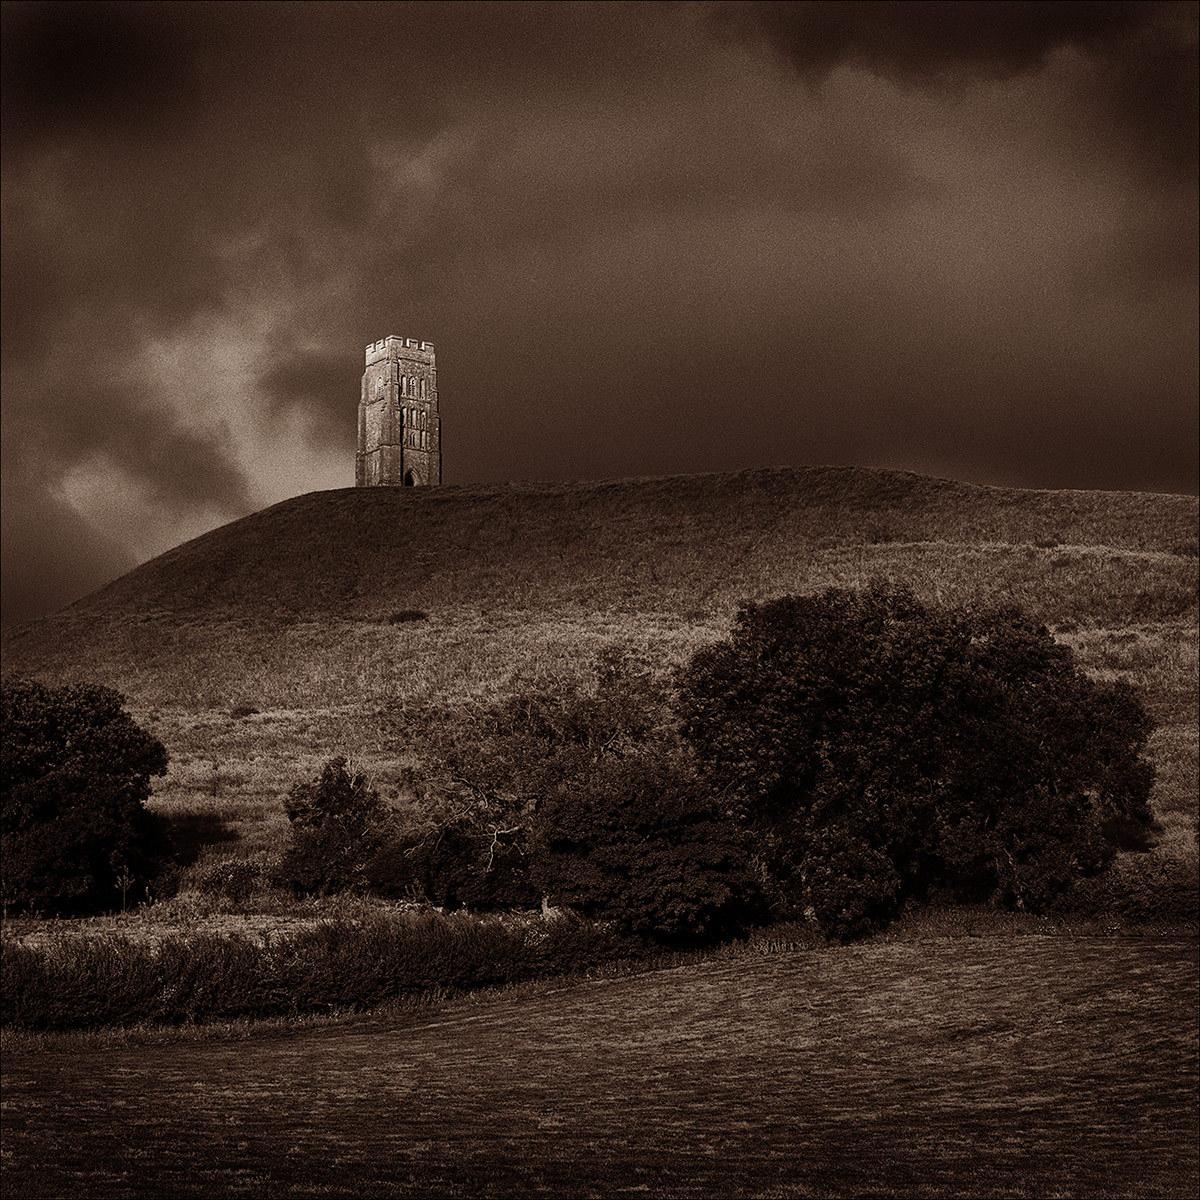 Bruce Starrenburg Photography website